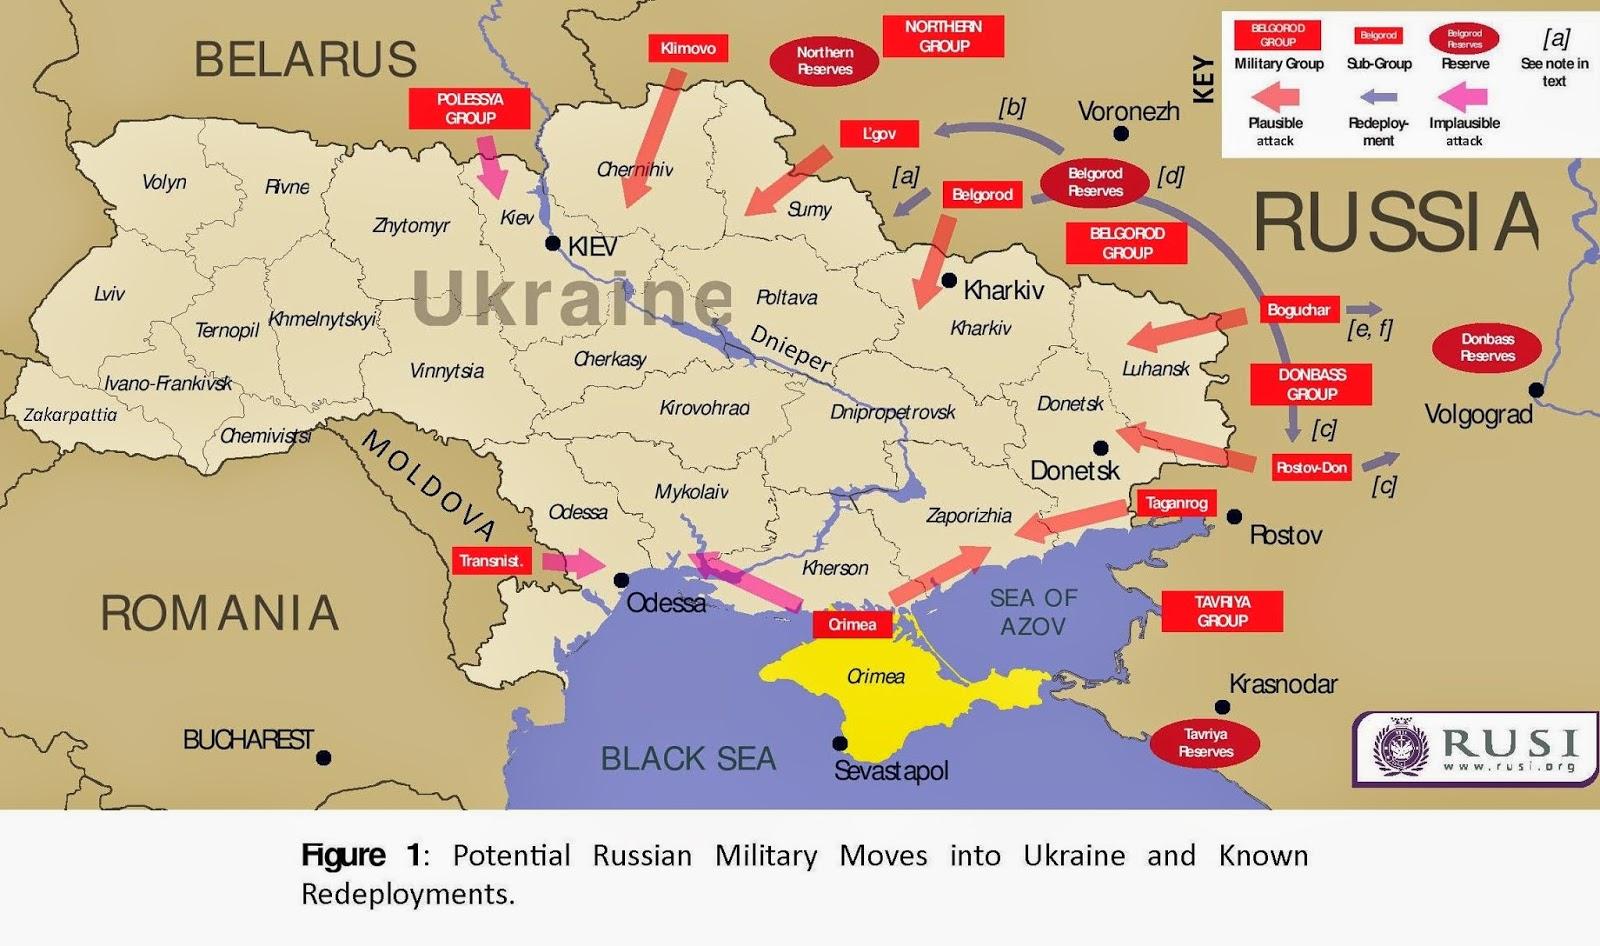 Posible intervención rusa en Ucrania - Blog Geografía Política